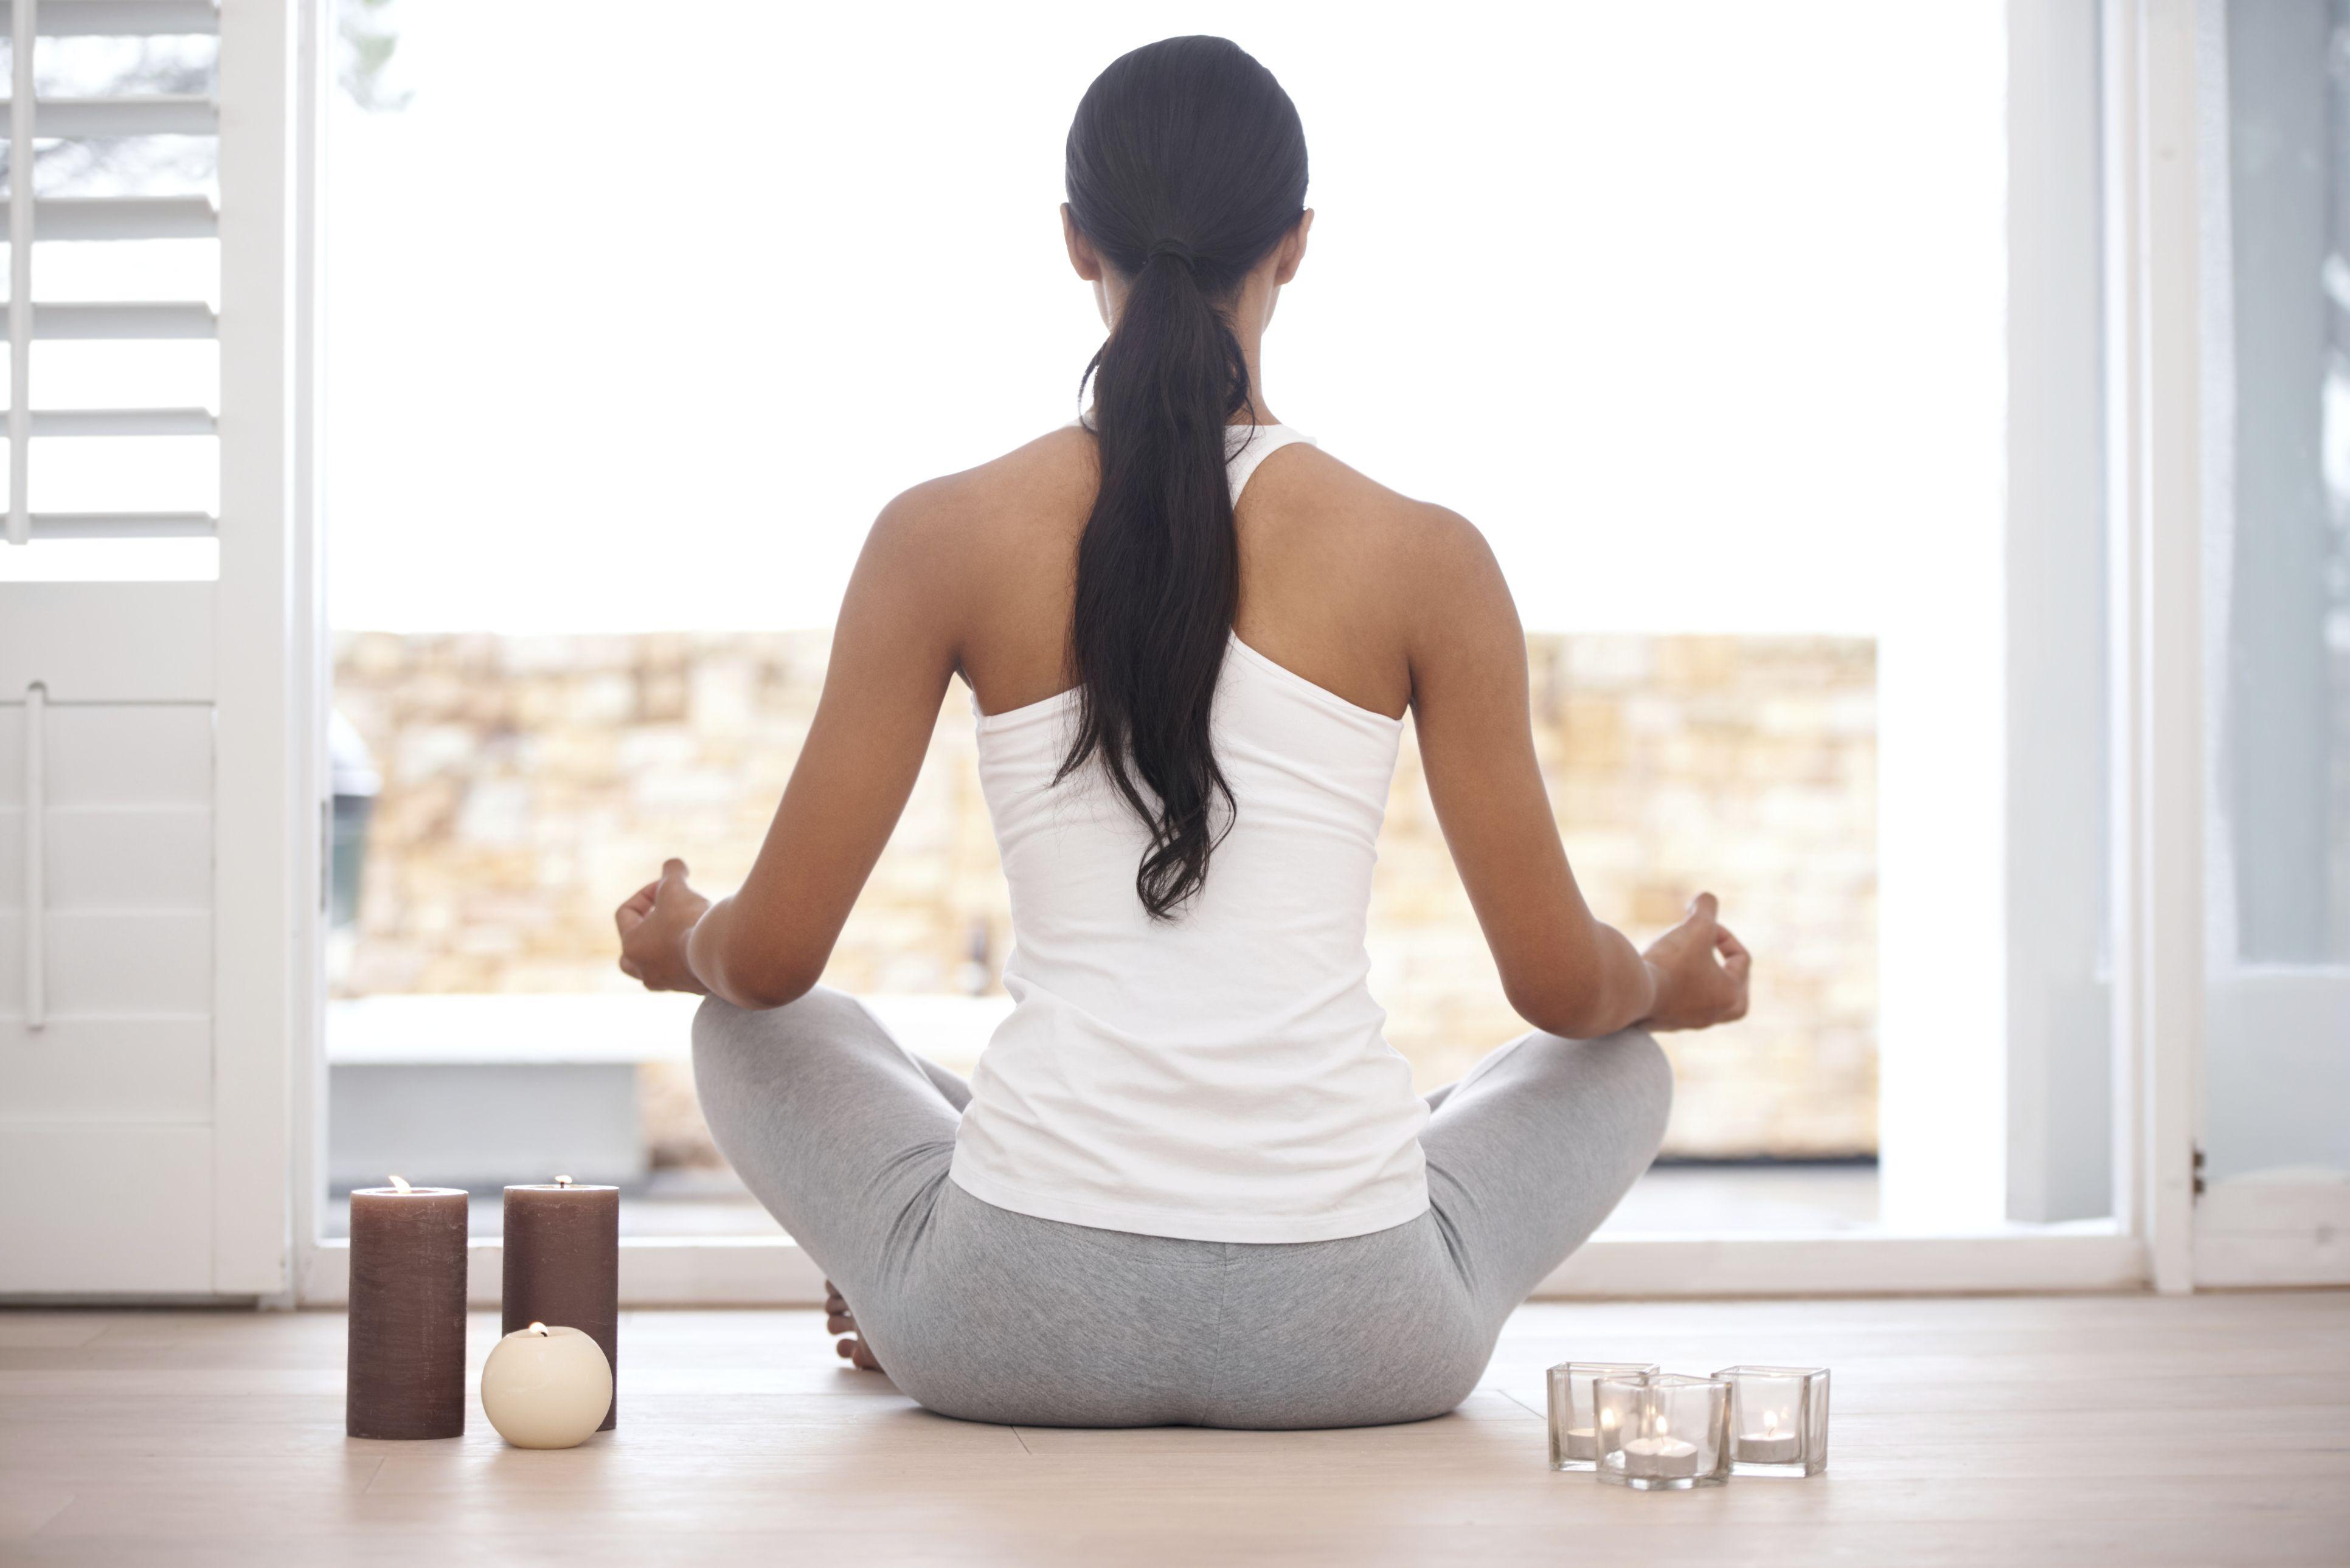 6 Alternative Treatments for High Blood Pressure